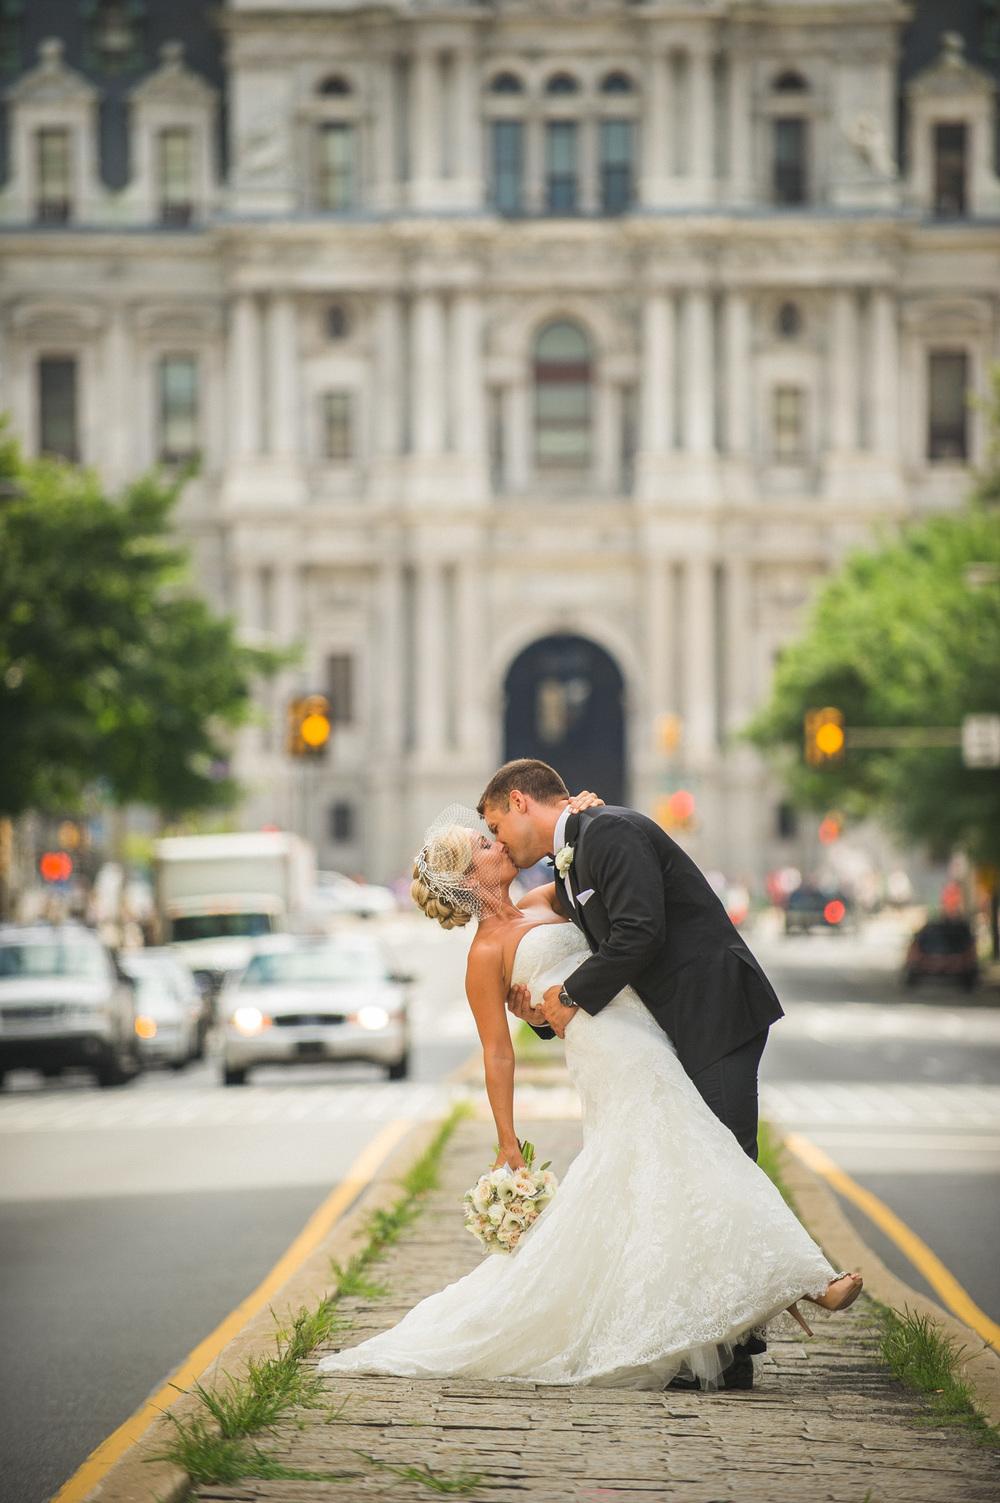 front-and-palmer-philadelphia-wedding-23.jpg